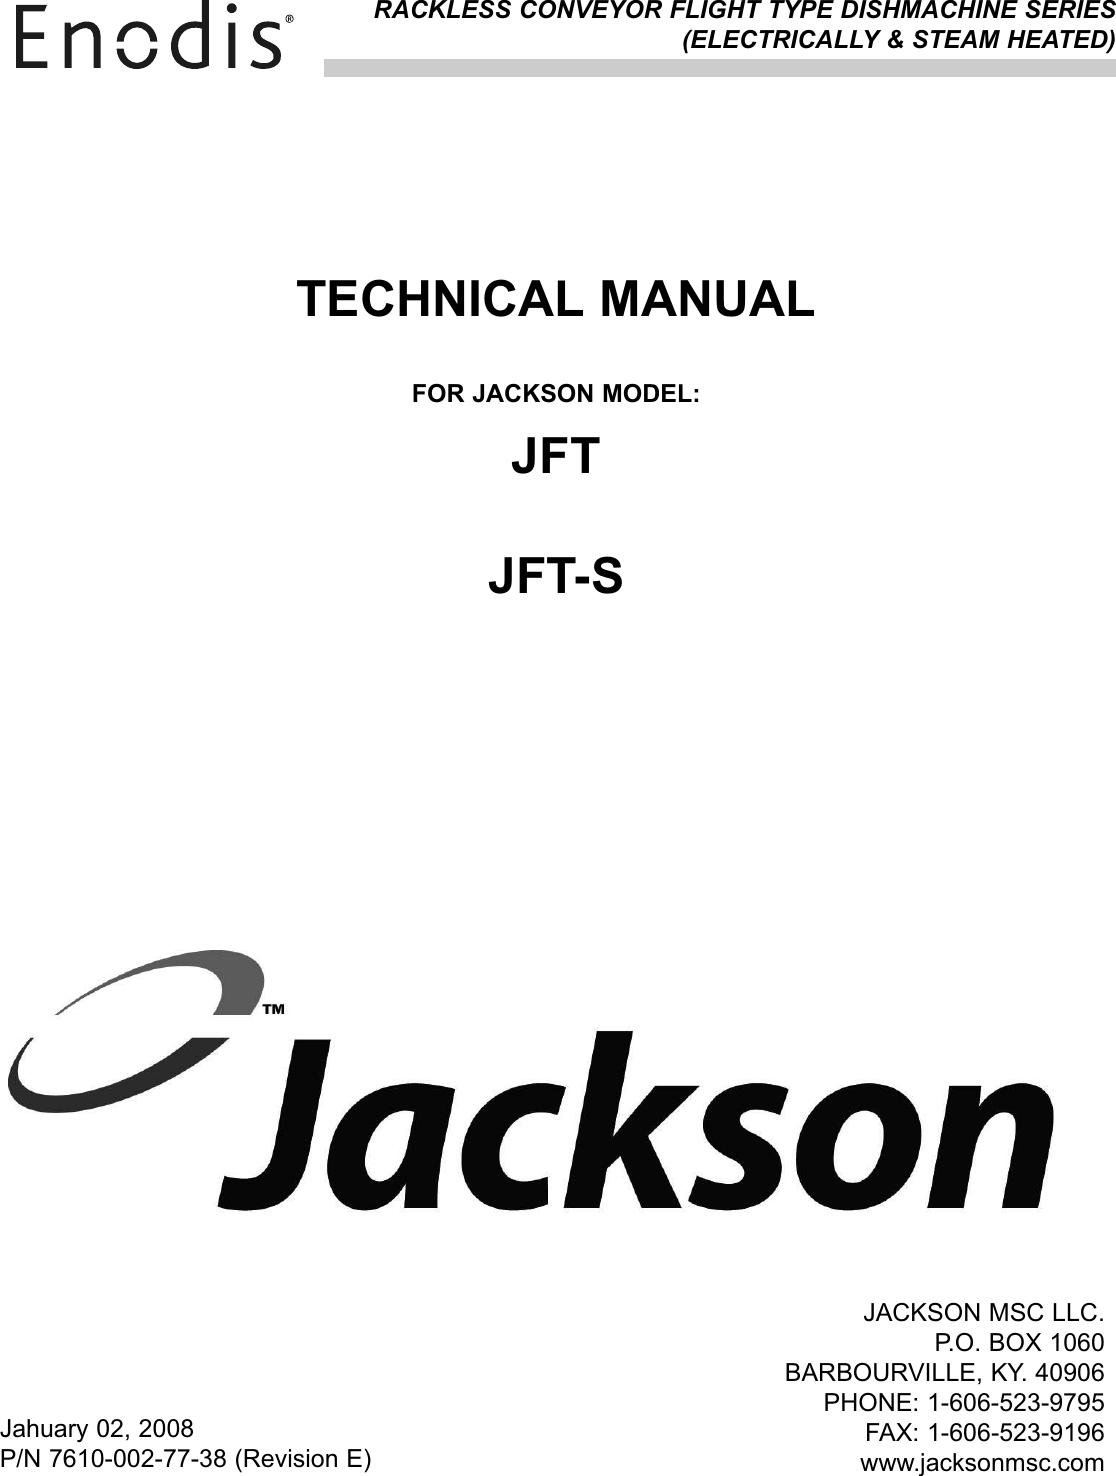 Jackson Dishwasher Jft Users Manual 7610 002 77 38e_ Jft_jft ... on